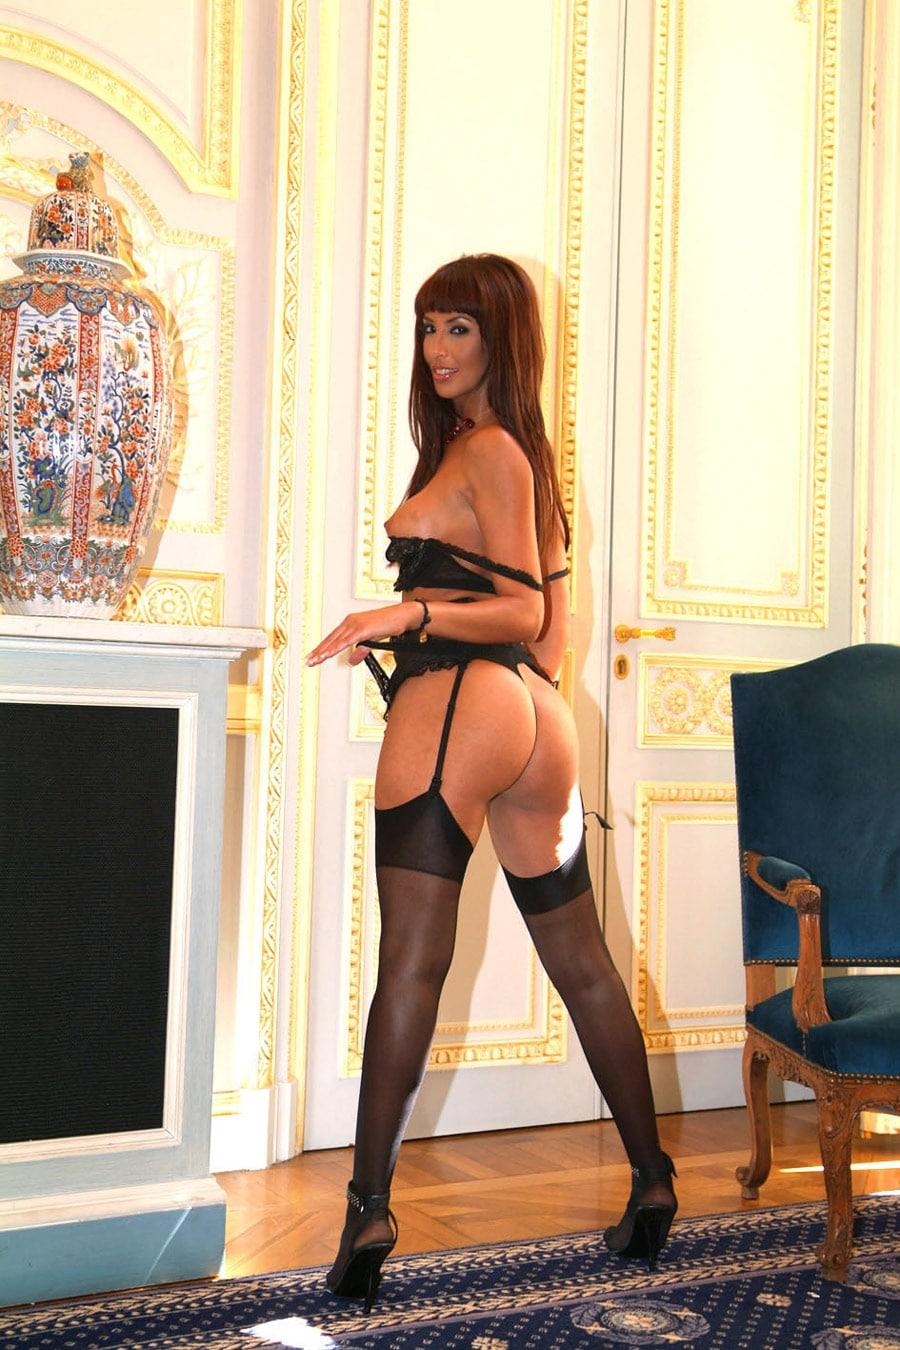 yasmine-bourgeoise-marocaine-sexy-porte-jarretelles-4